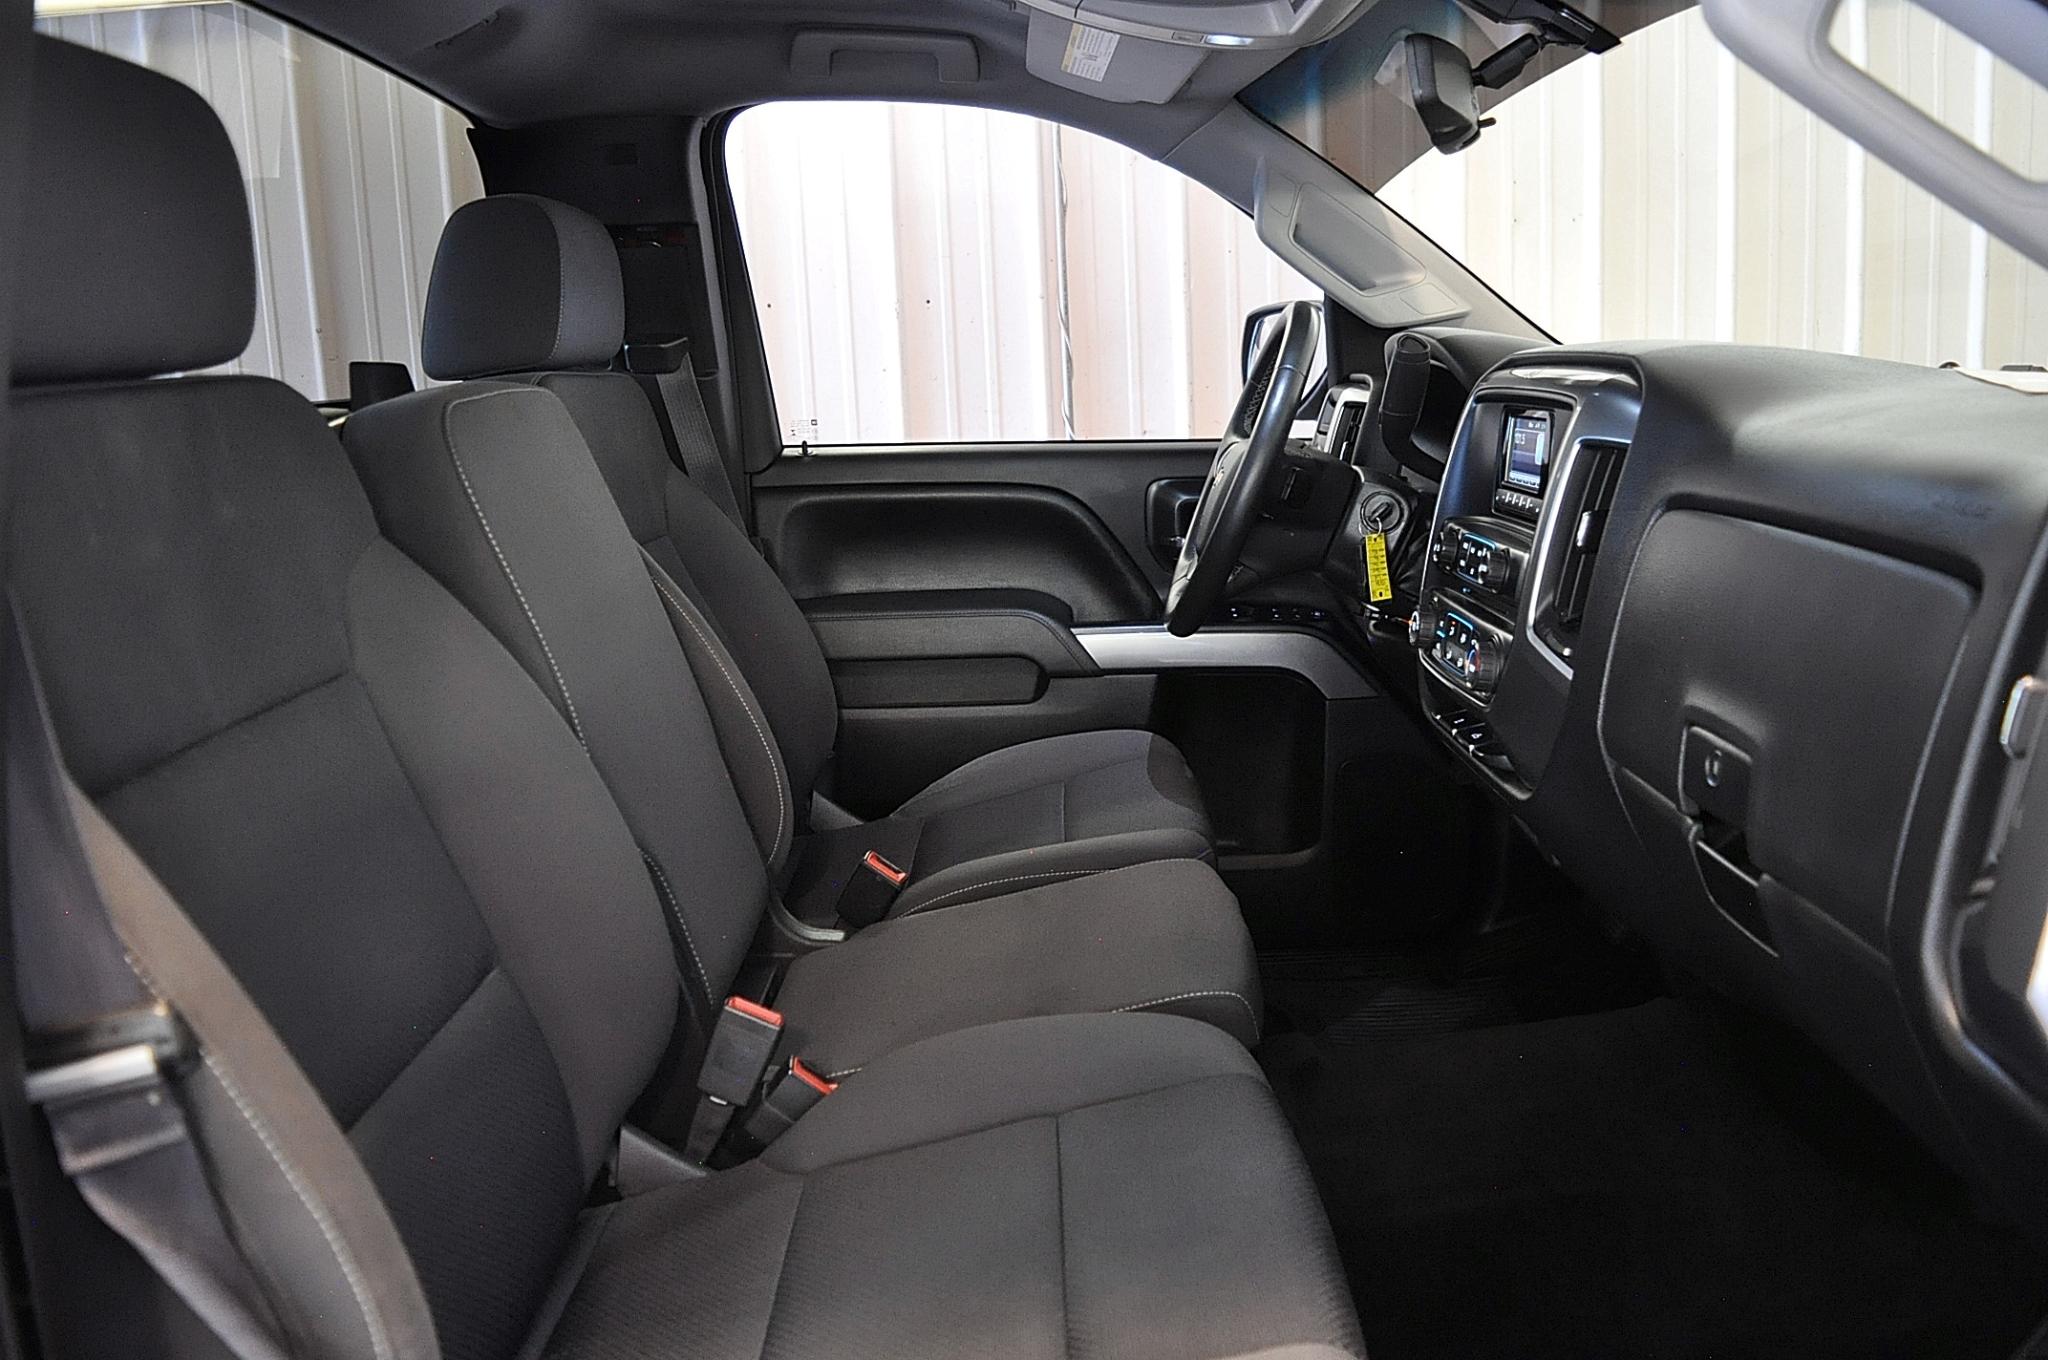 Chevrolet Silverado 1500 1LT Regular Cab 4WD 2014